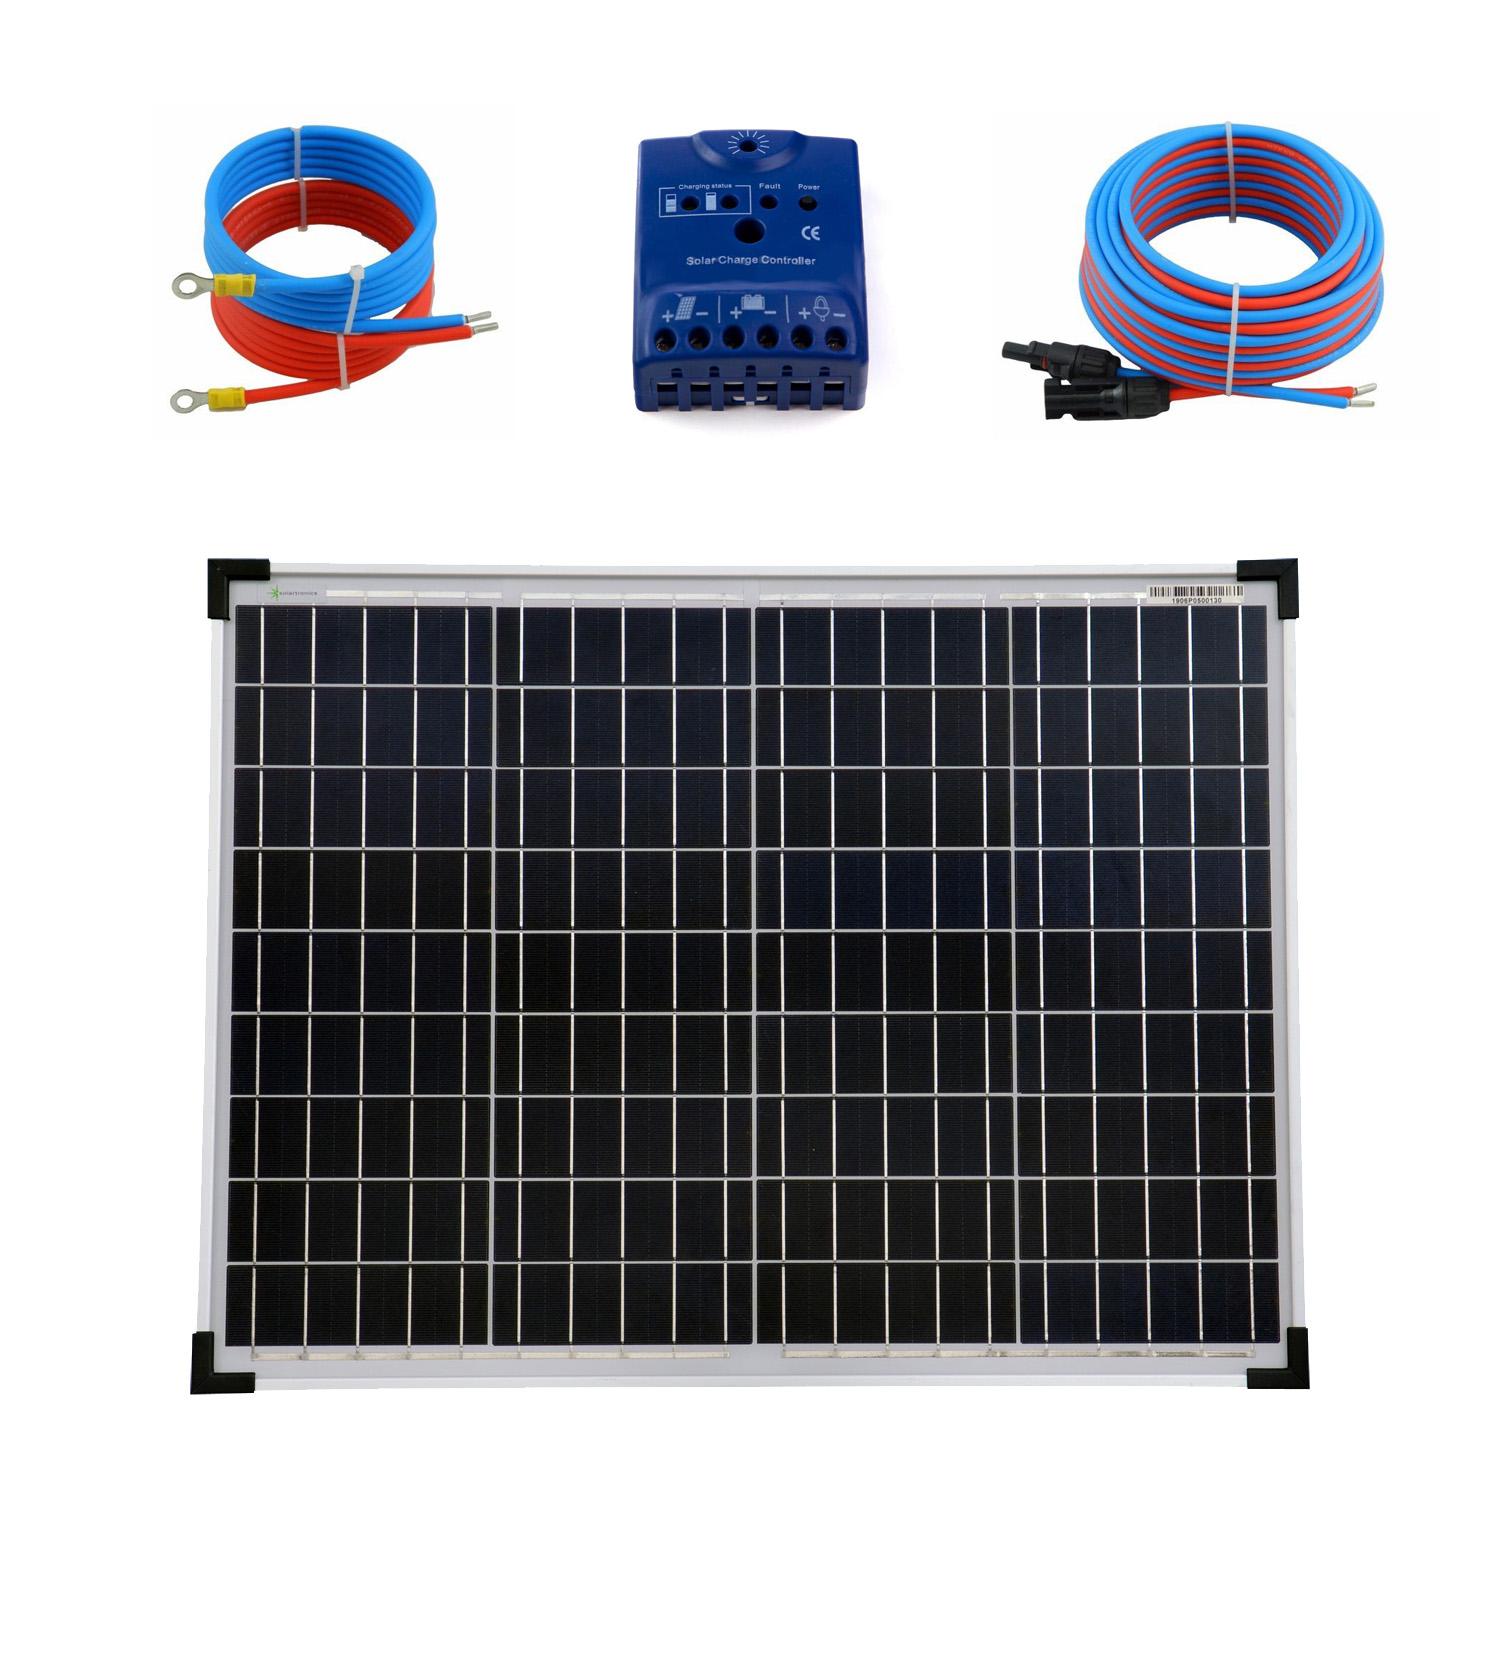 Solarmodul 100 Watt flexibel Mono Solarpanel Solarzelle 1100x542x2 92121 Photovoltaik